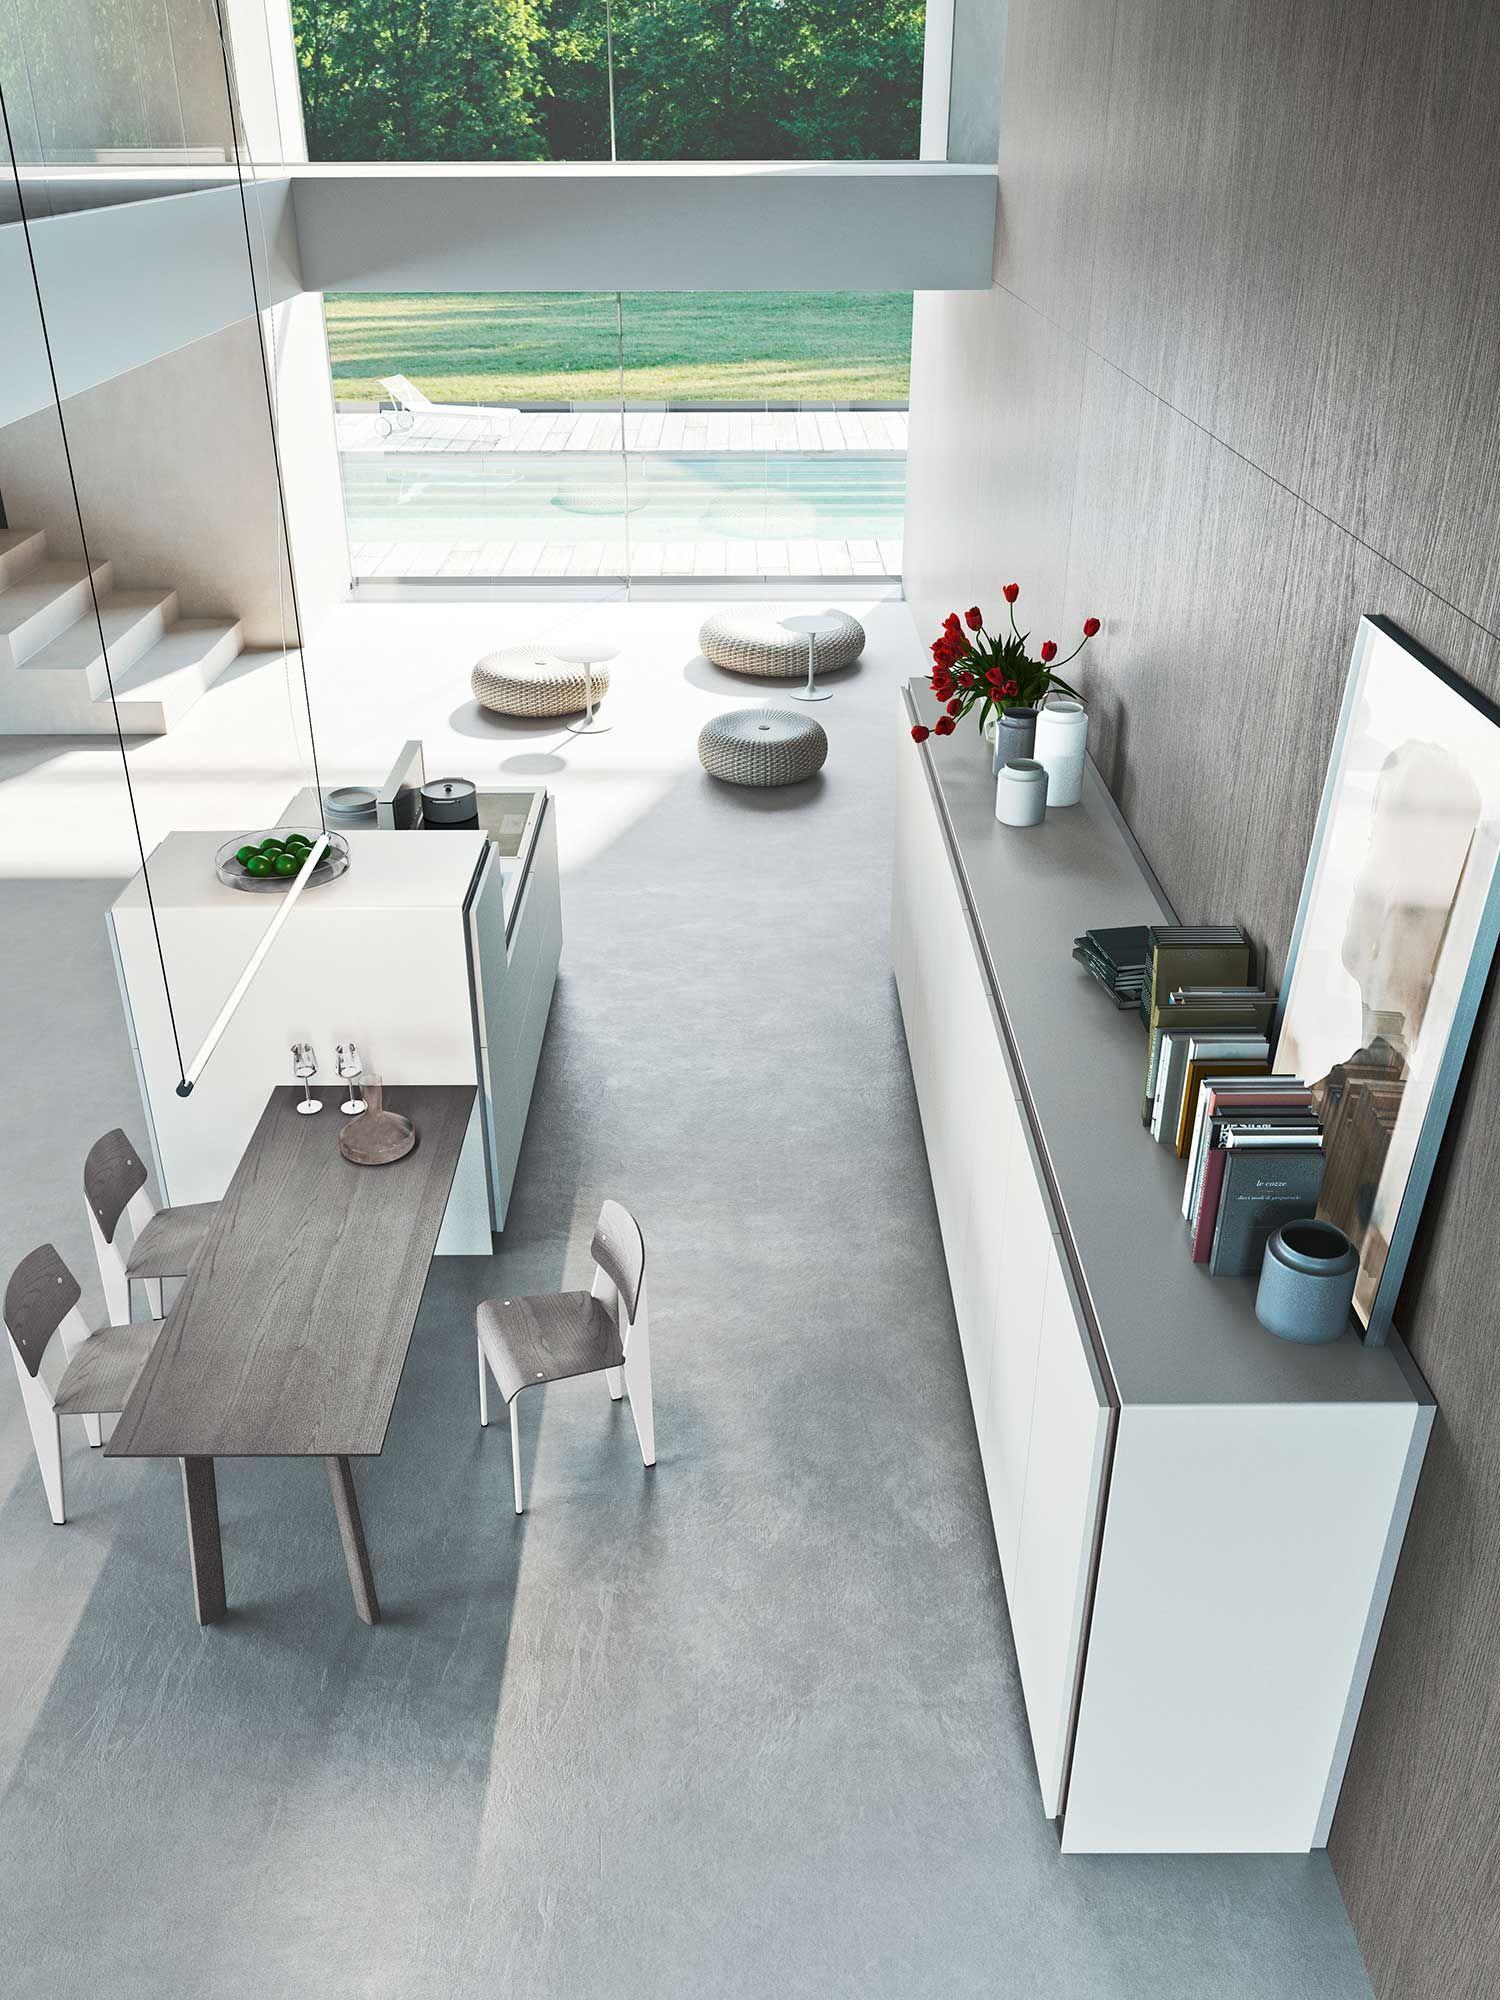 cucina moderna Elle | Interior design - home | Pinterest | Cucine ...